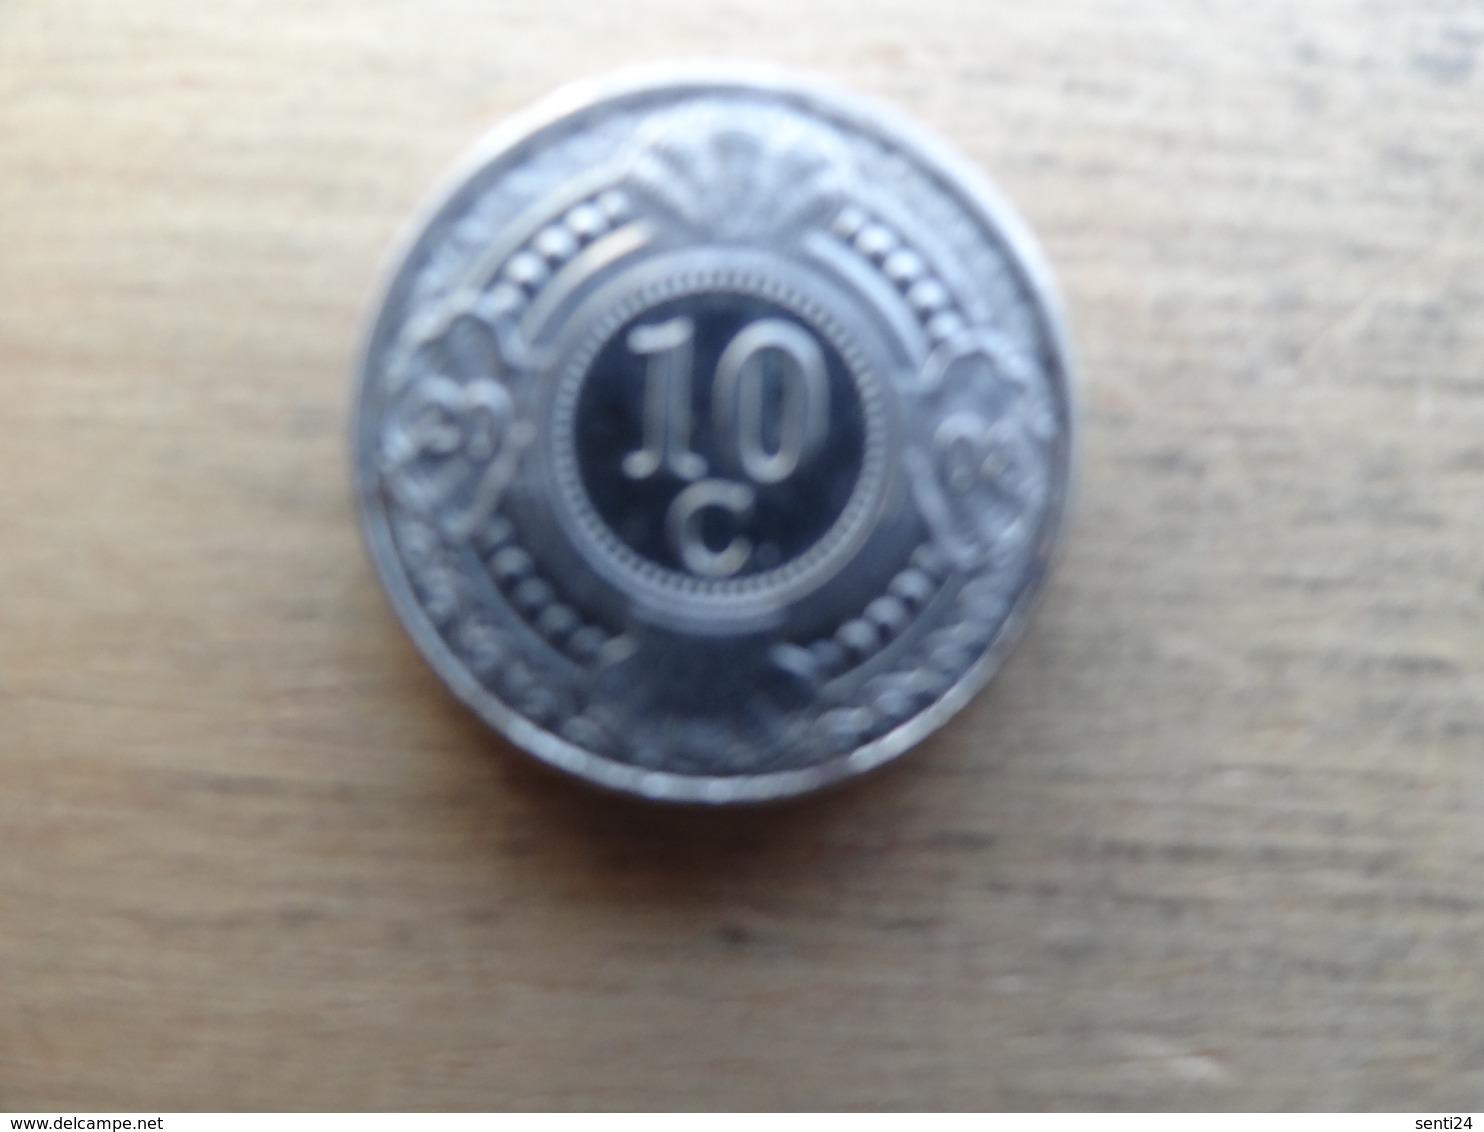 Antilles  Neerlandaises    10  Cents  2008  Km 34 - Antillen (Niederländische)